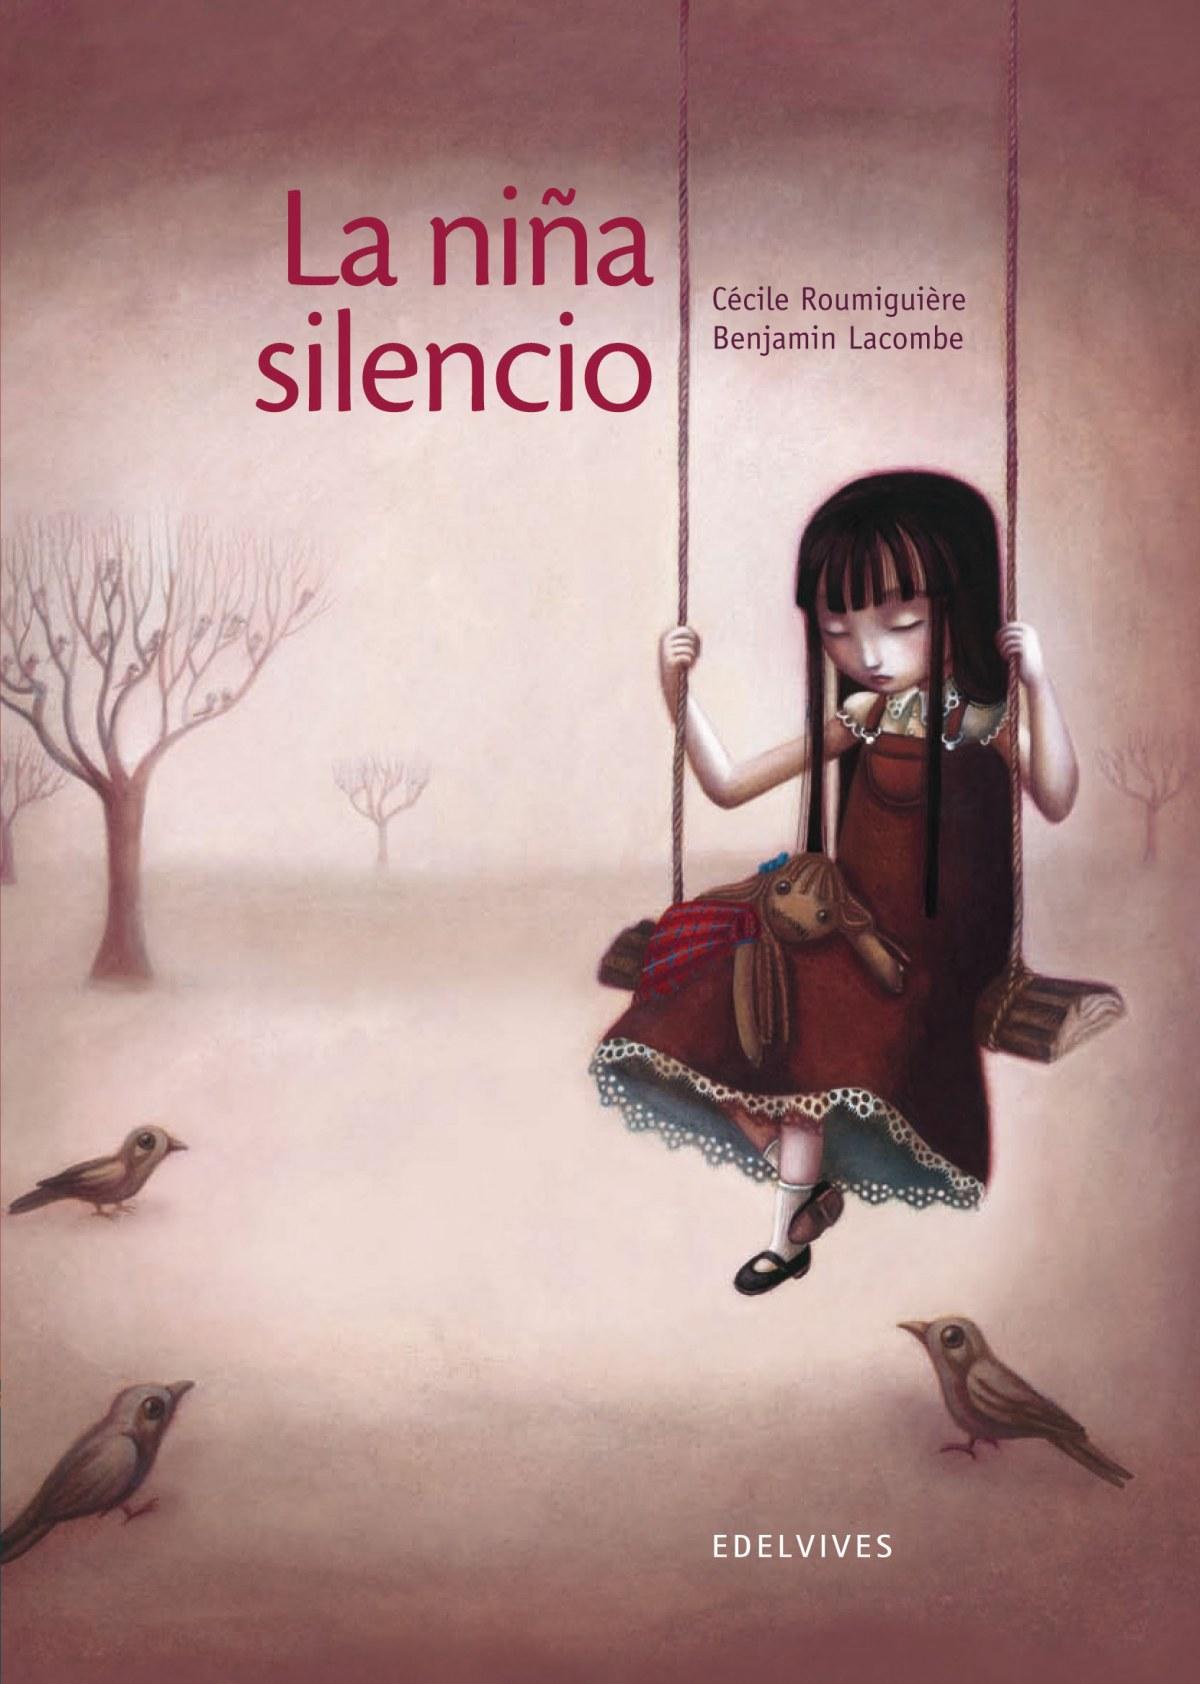 La niña silencio 9788426381811